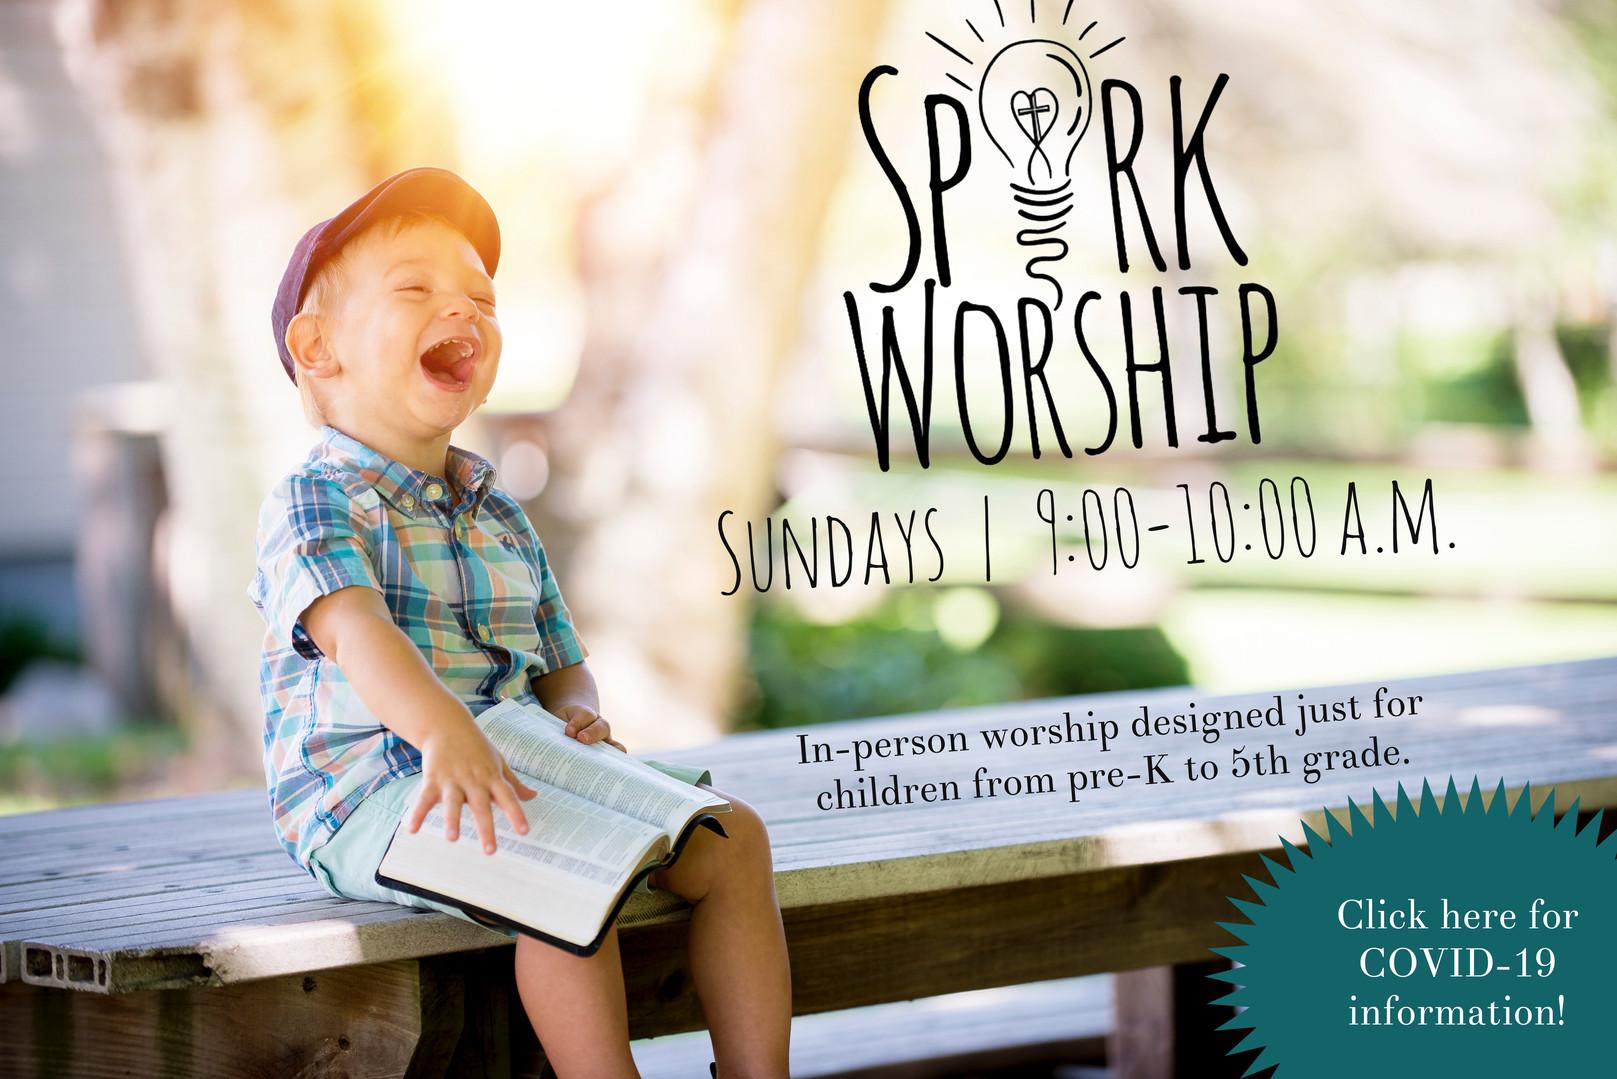 Spark Worship